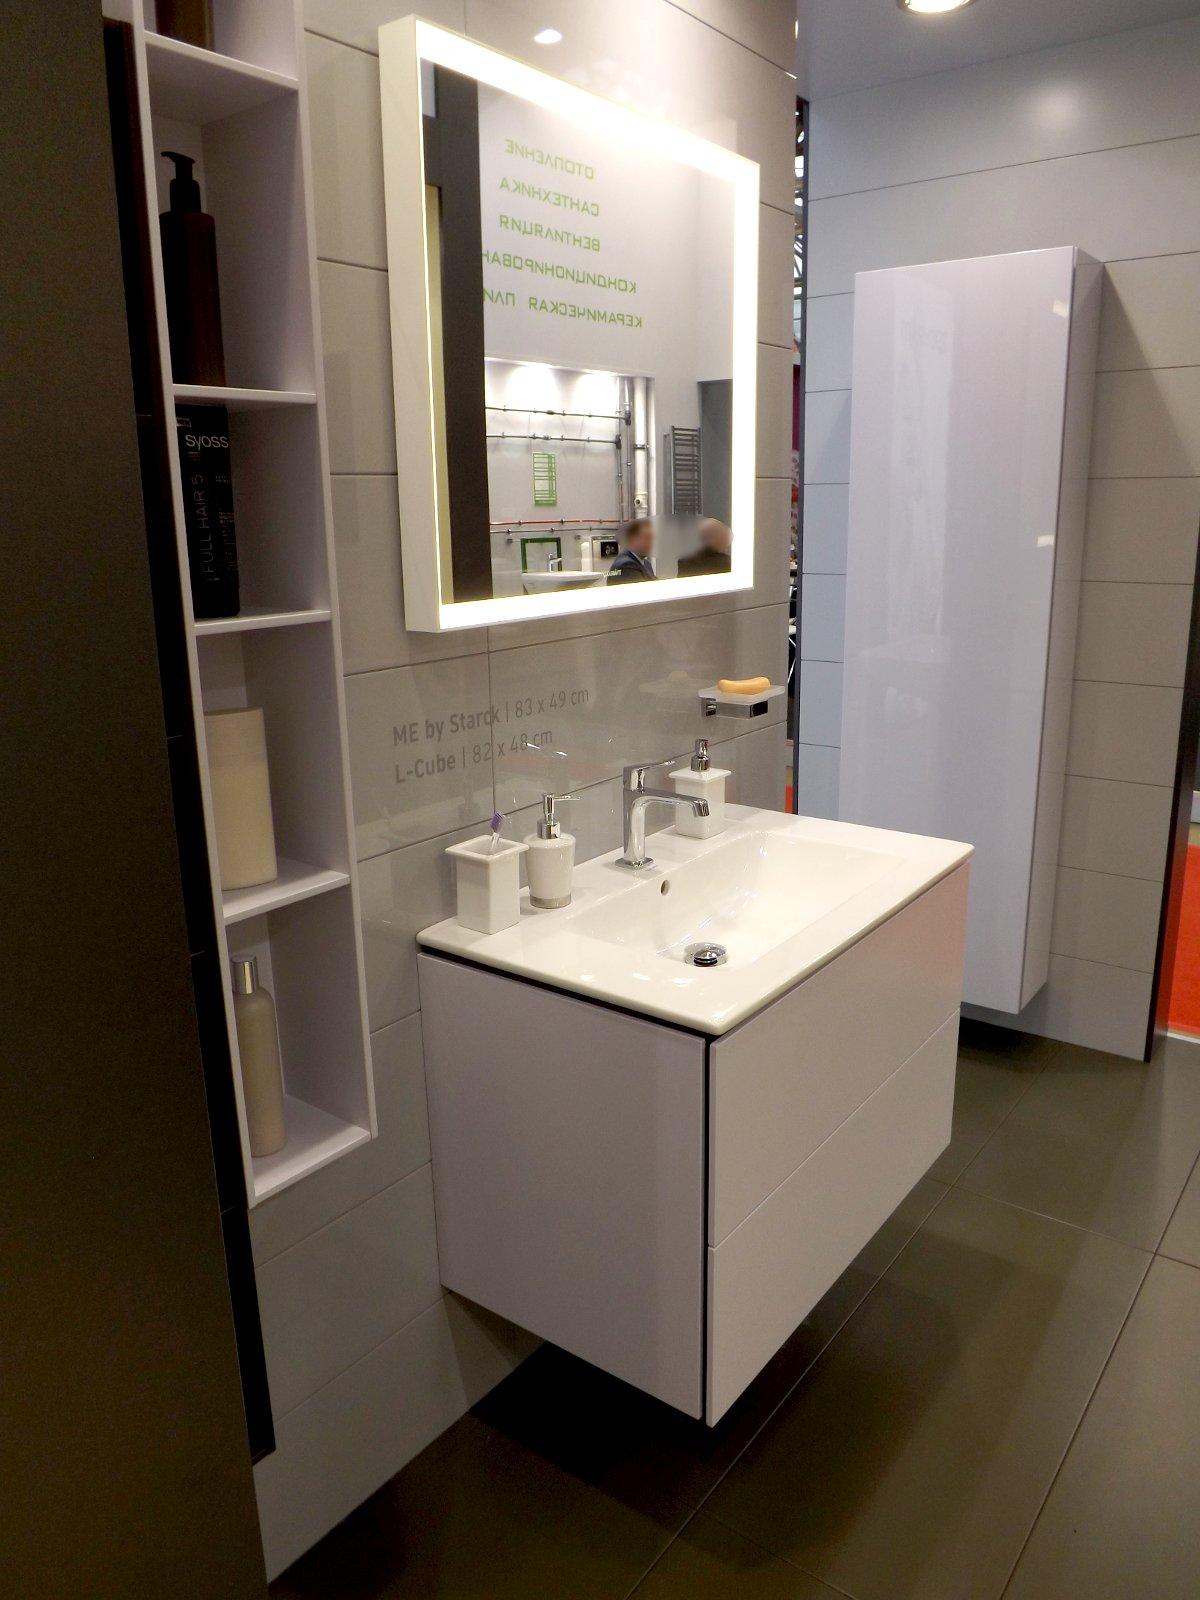 Мебель для ванной и зеркало L-Cube с раковиной ME by Starck от Duravit на выставке МосБилд 2015. Вид А